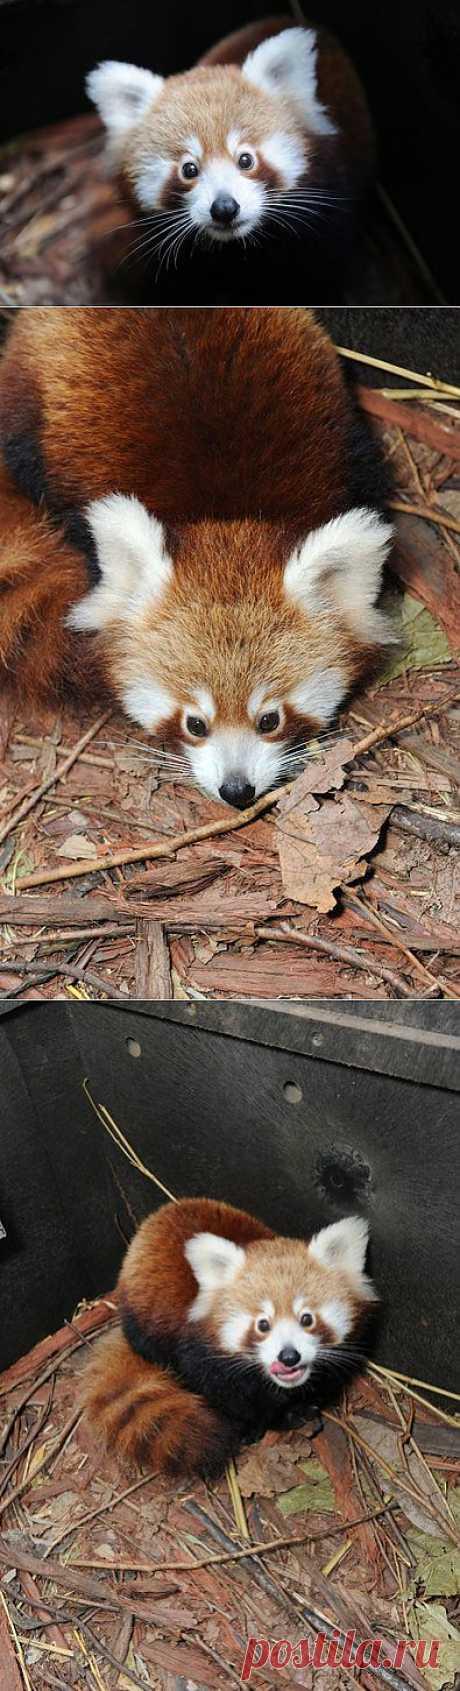 Firefox 45 | Fresher - Лучшее из Рунета за день